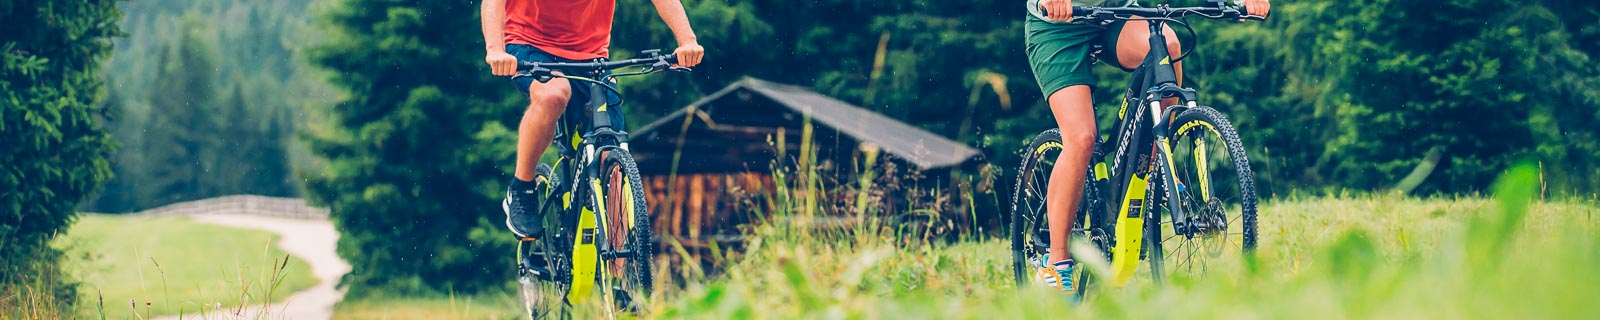 Haibike E-Bike Cross- und Fitnessräder